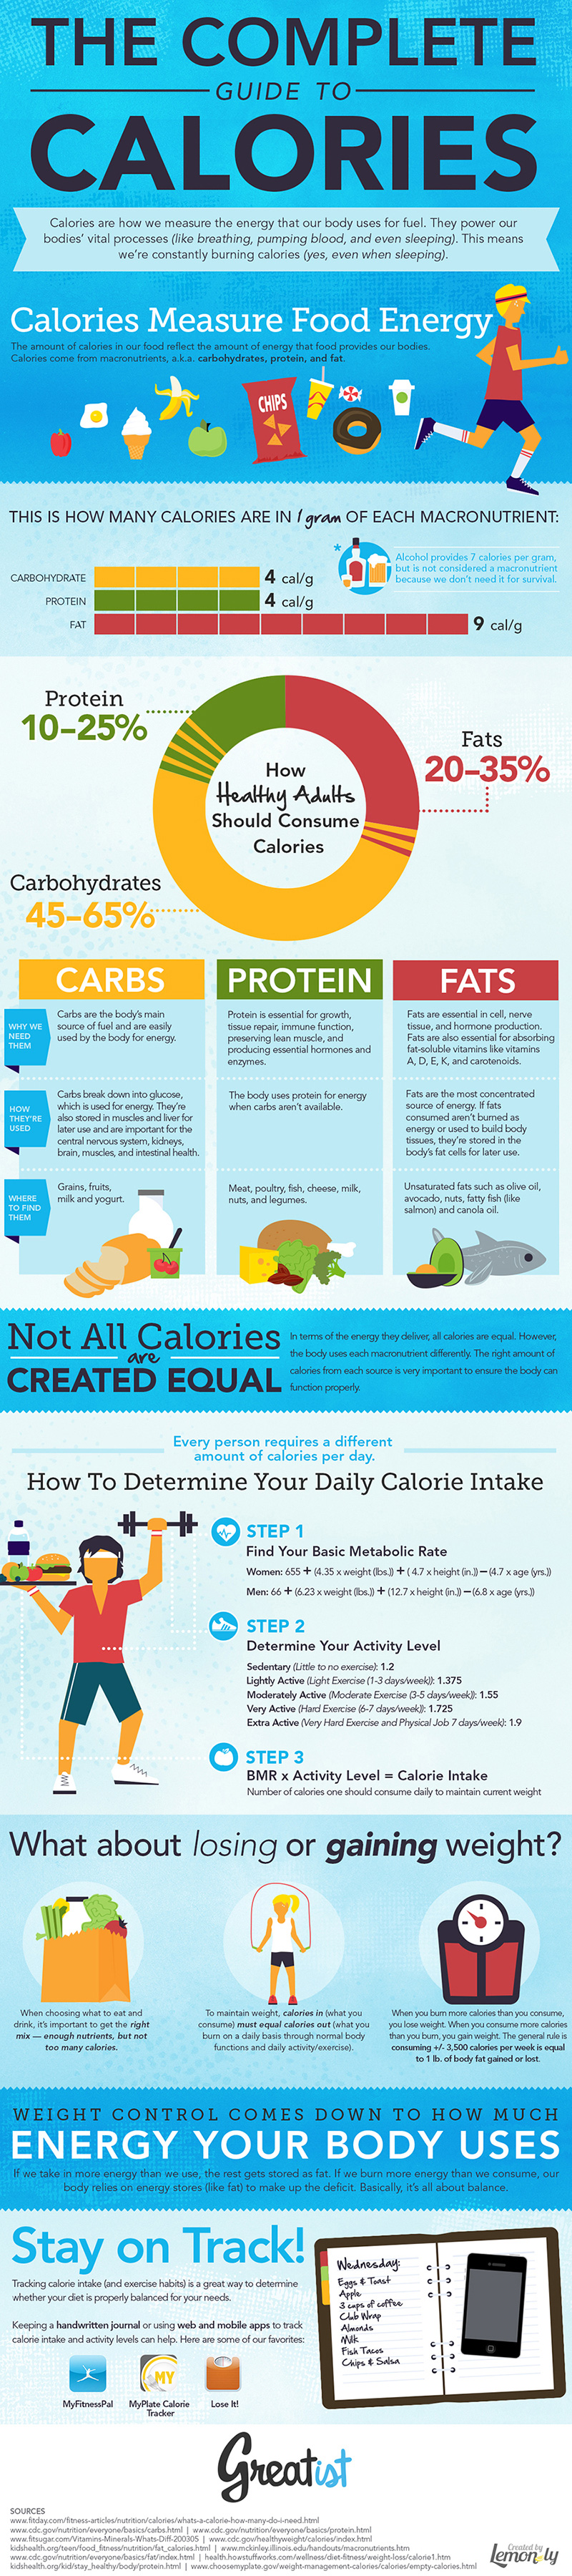 calculaing calories